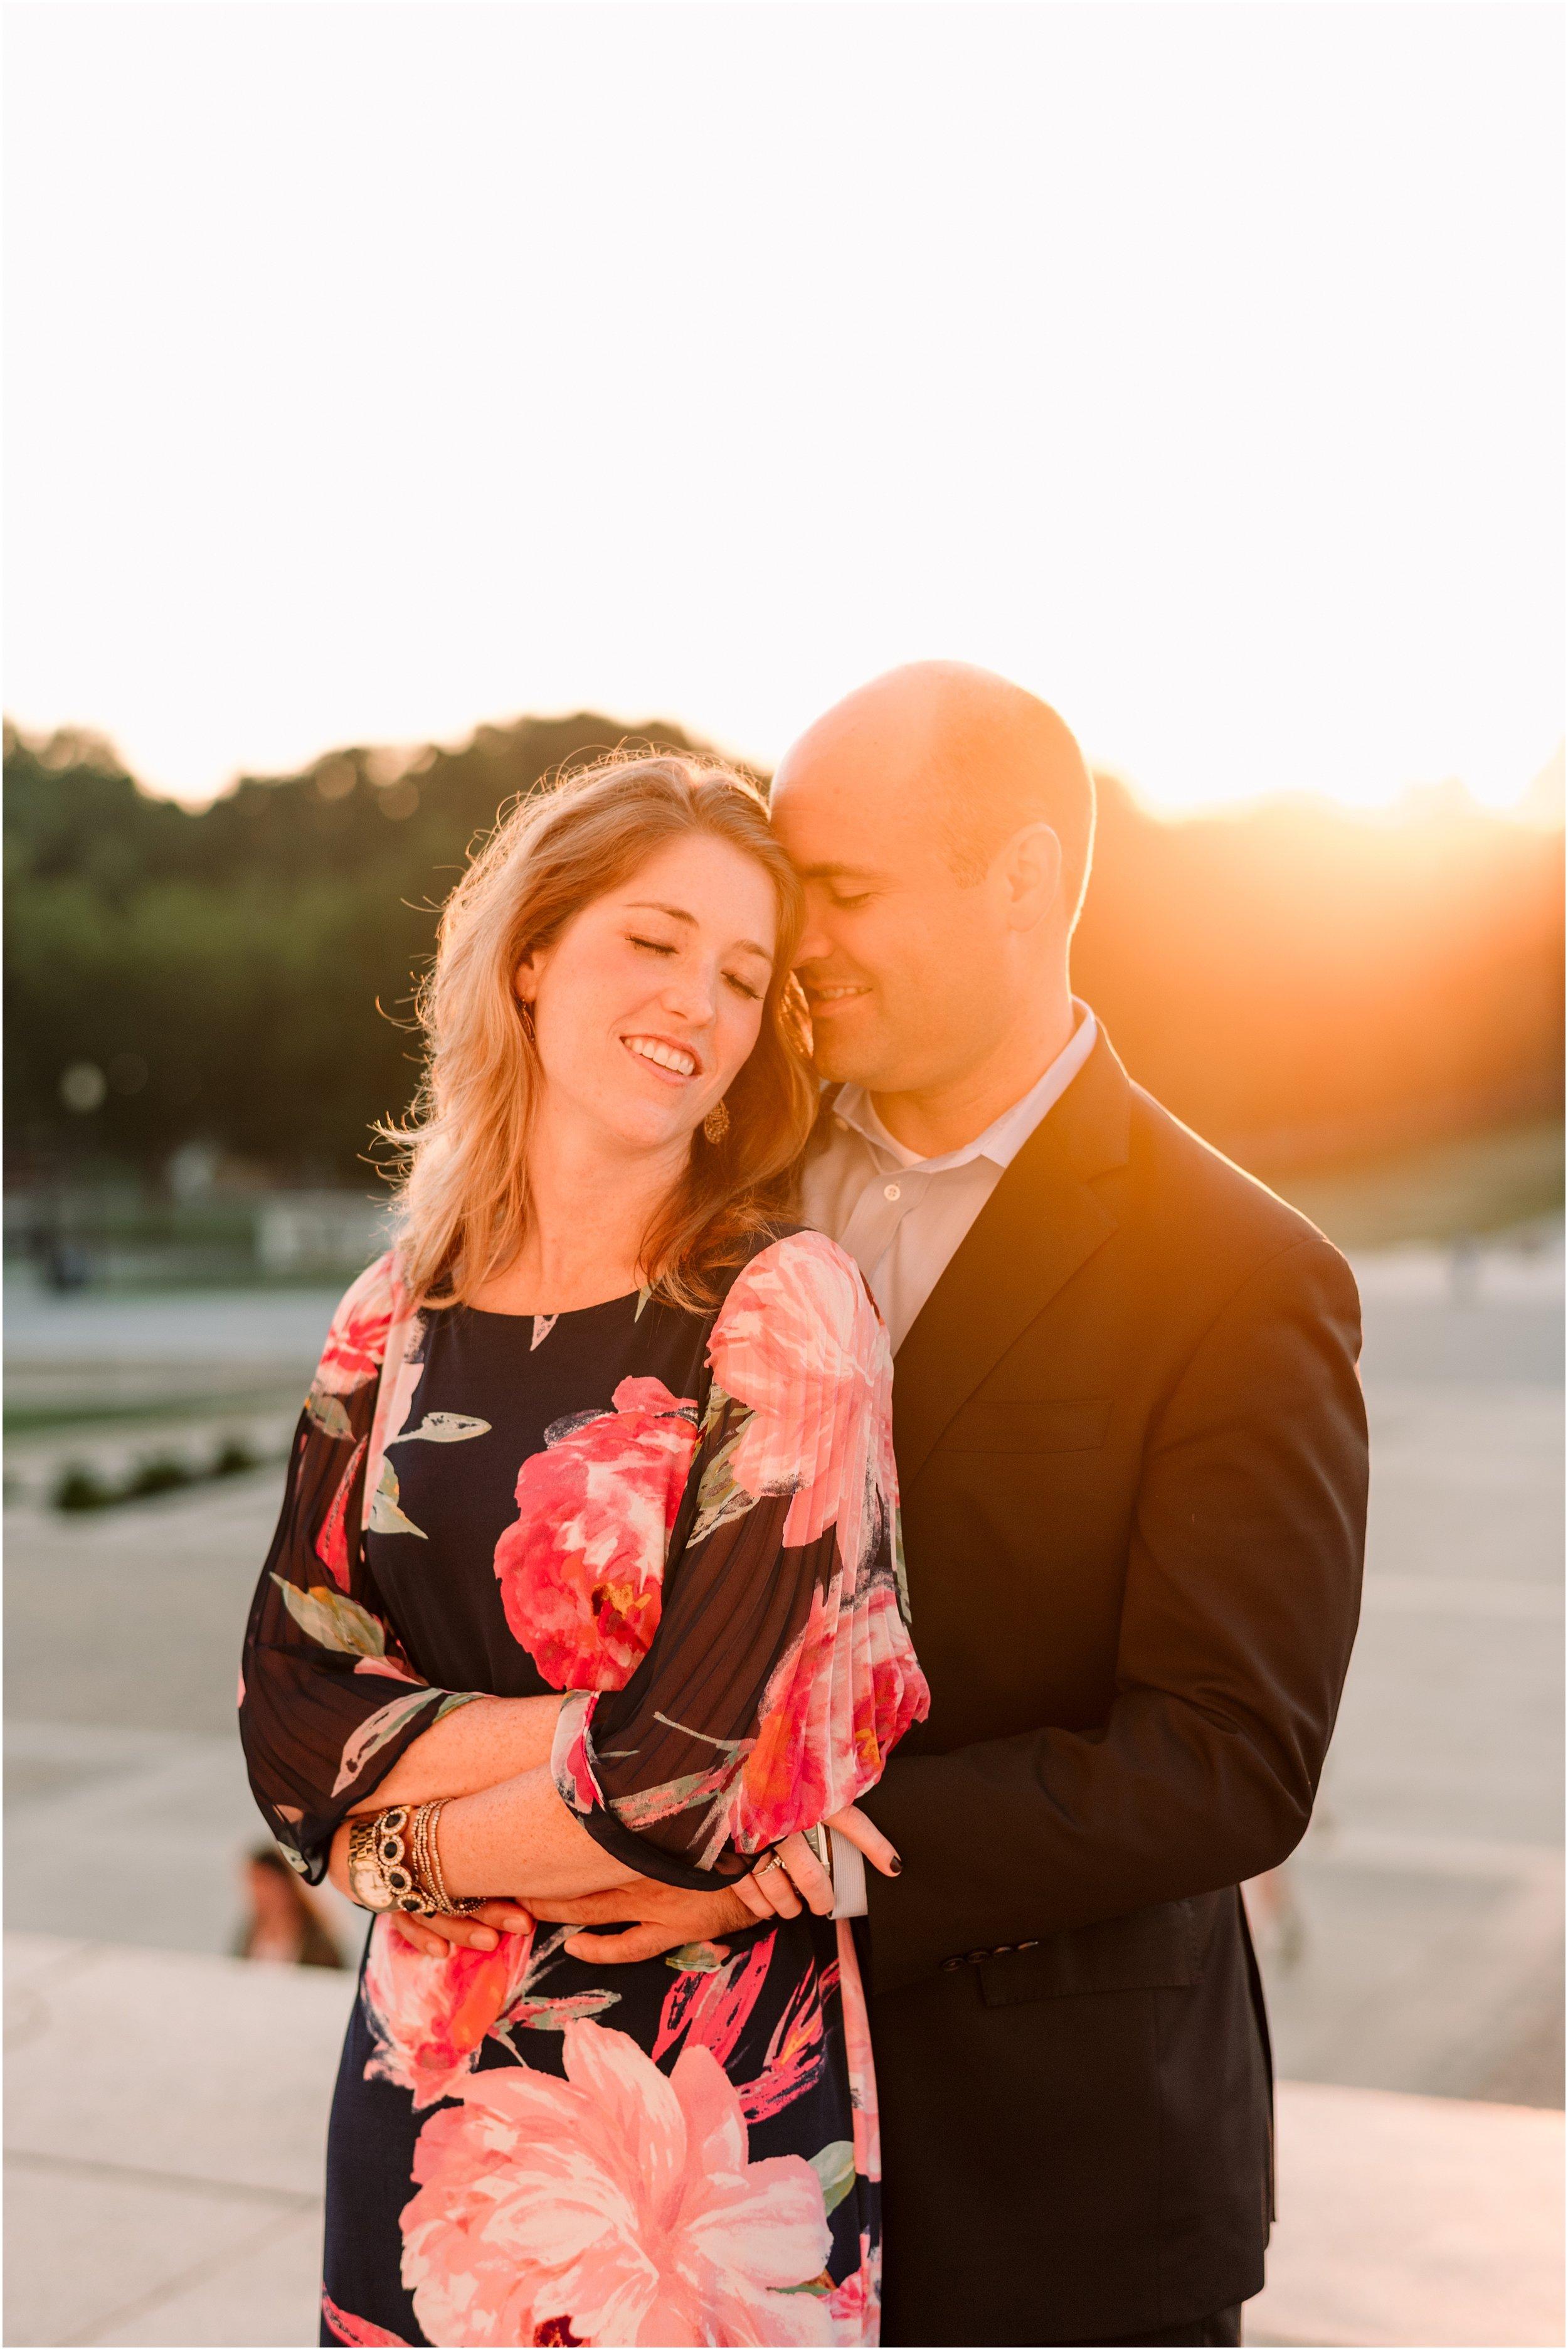 hannah leigh photography Sunrise Jefferson Memorial Engagement Session, Washington DC_1040.jpg